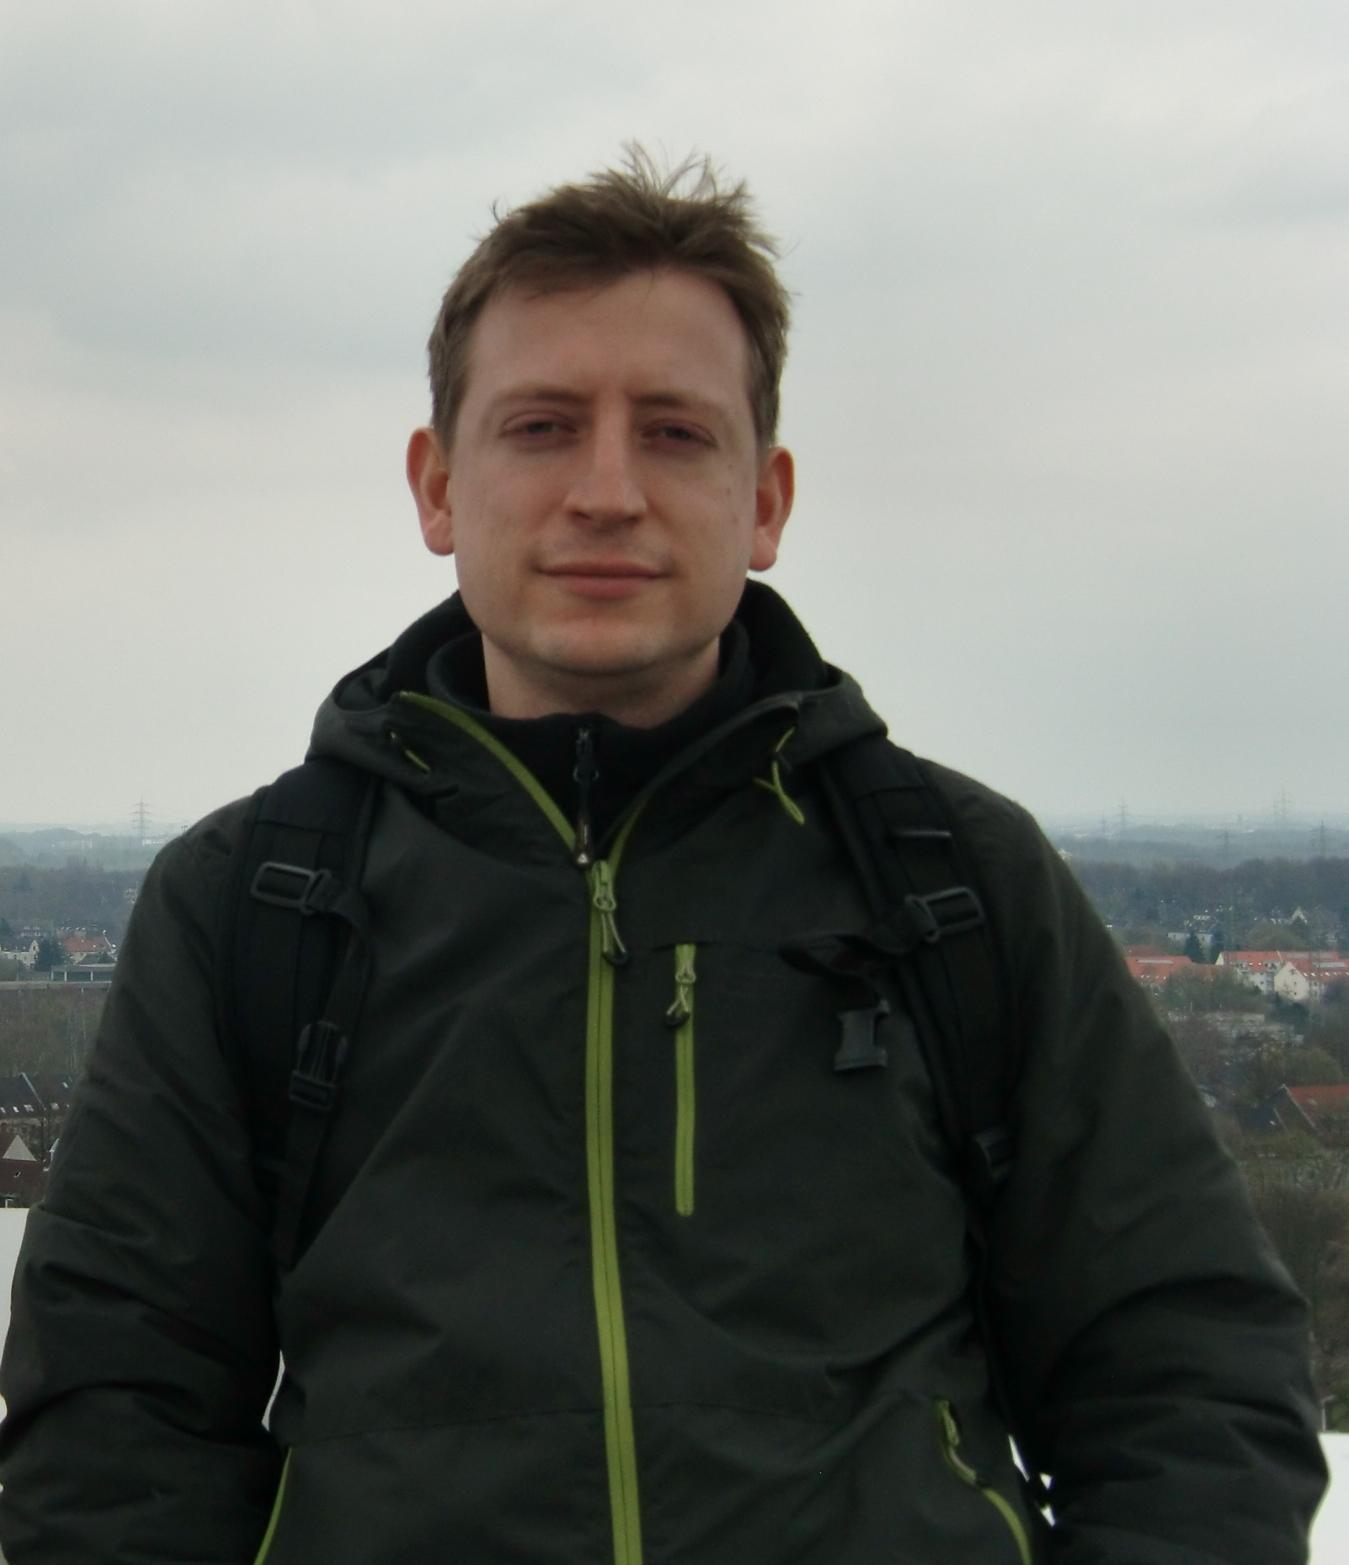 Daniel Steurich